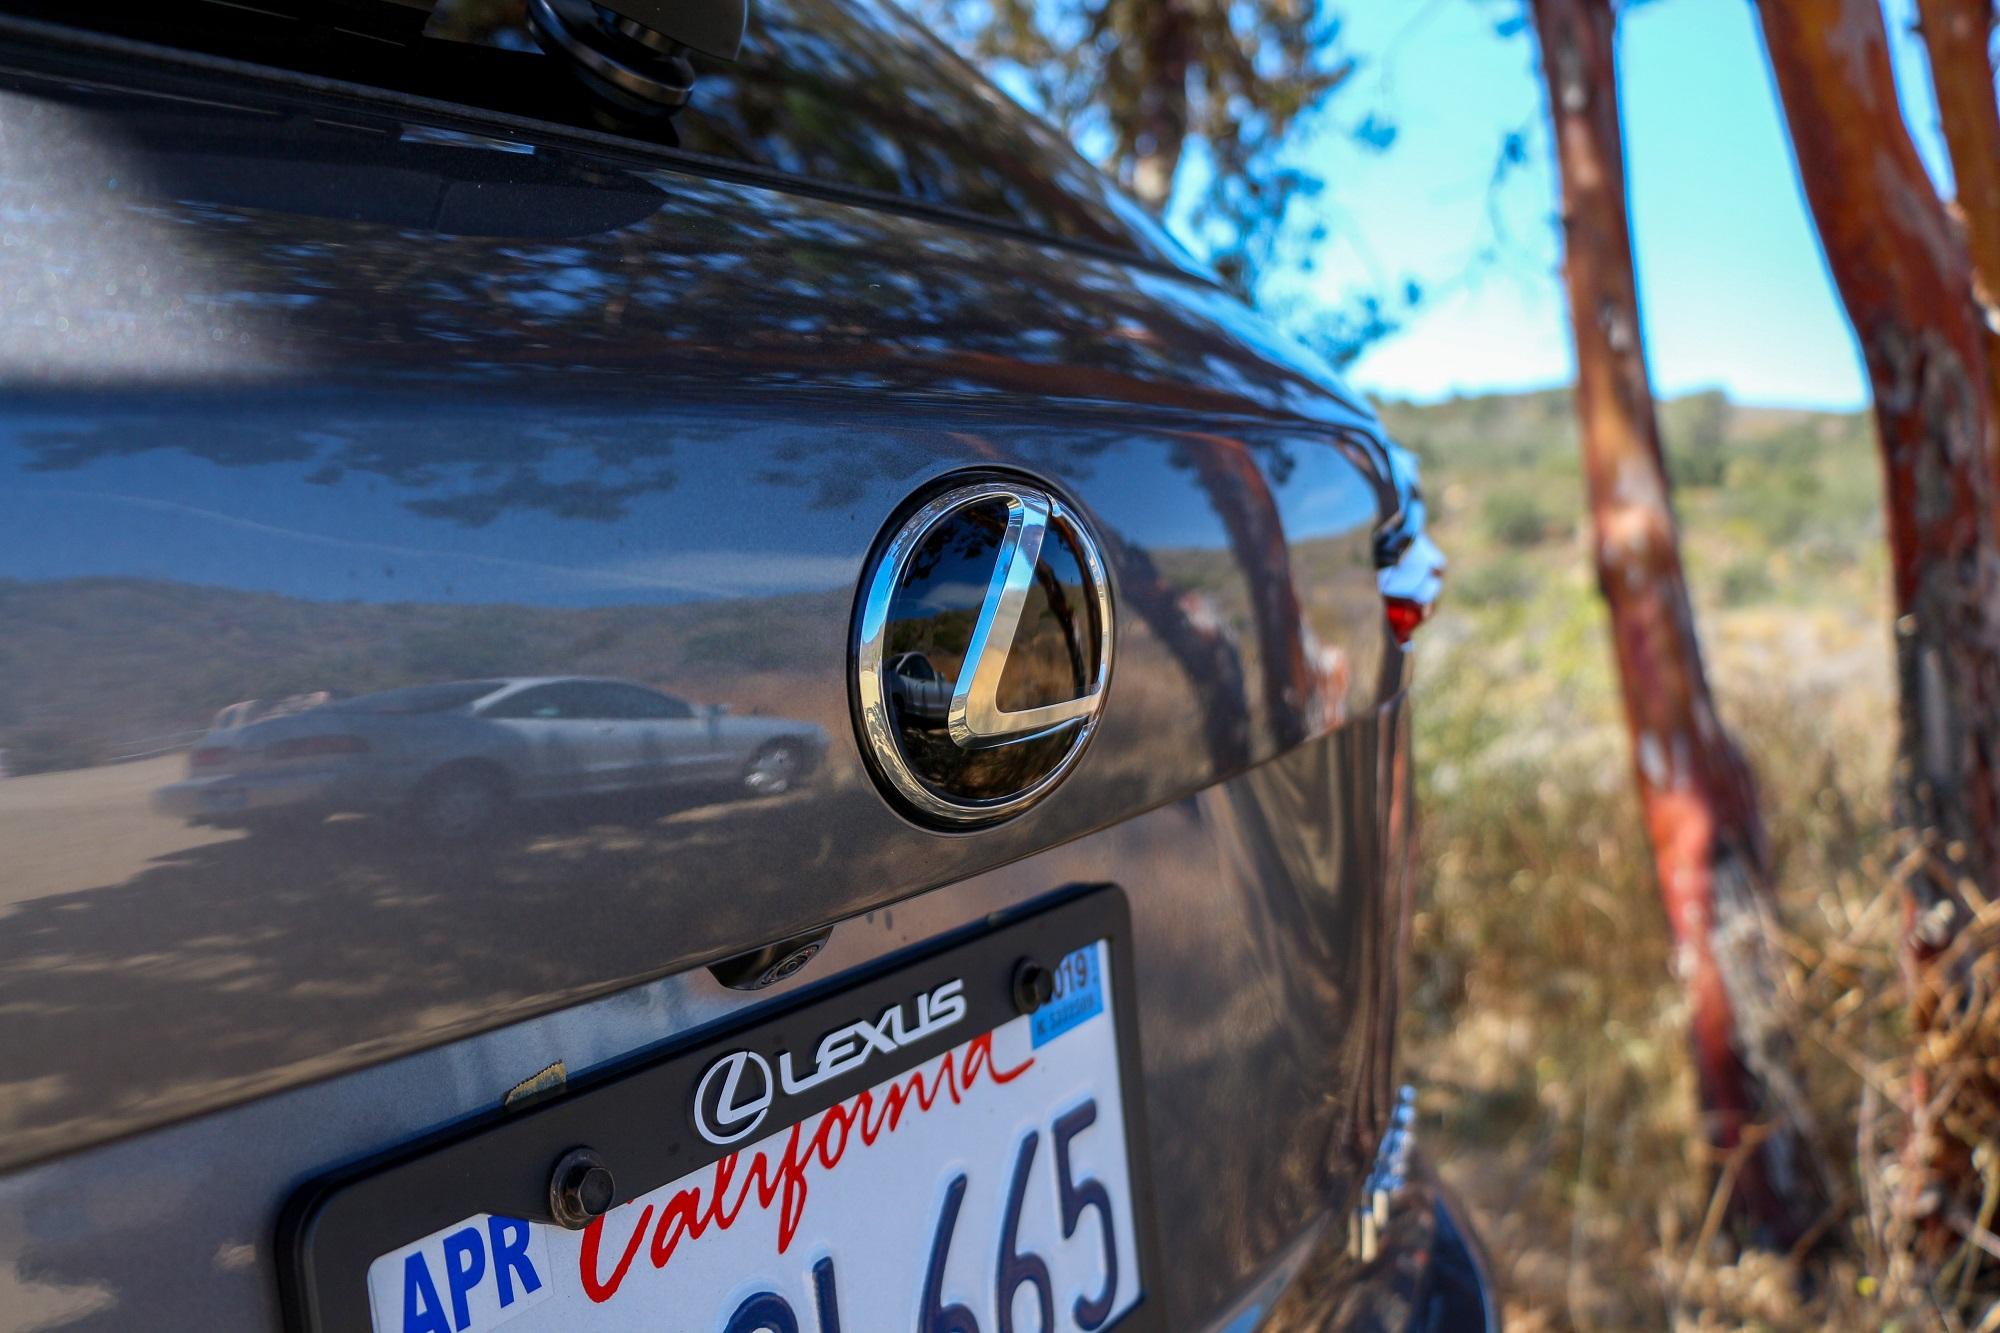 2019 Acura RDX vs. Infiniti QX50 vs. Lexus NX300 F-Sport Review Comparison Buying Guide Interior Options Price Exterior Colors Engine Reliability Drive Infotainment Packages Honda-tech.com Jake Stumph